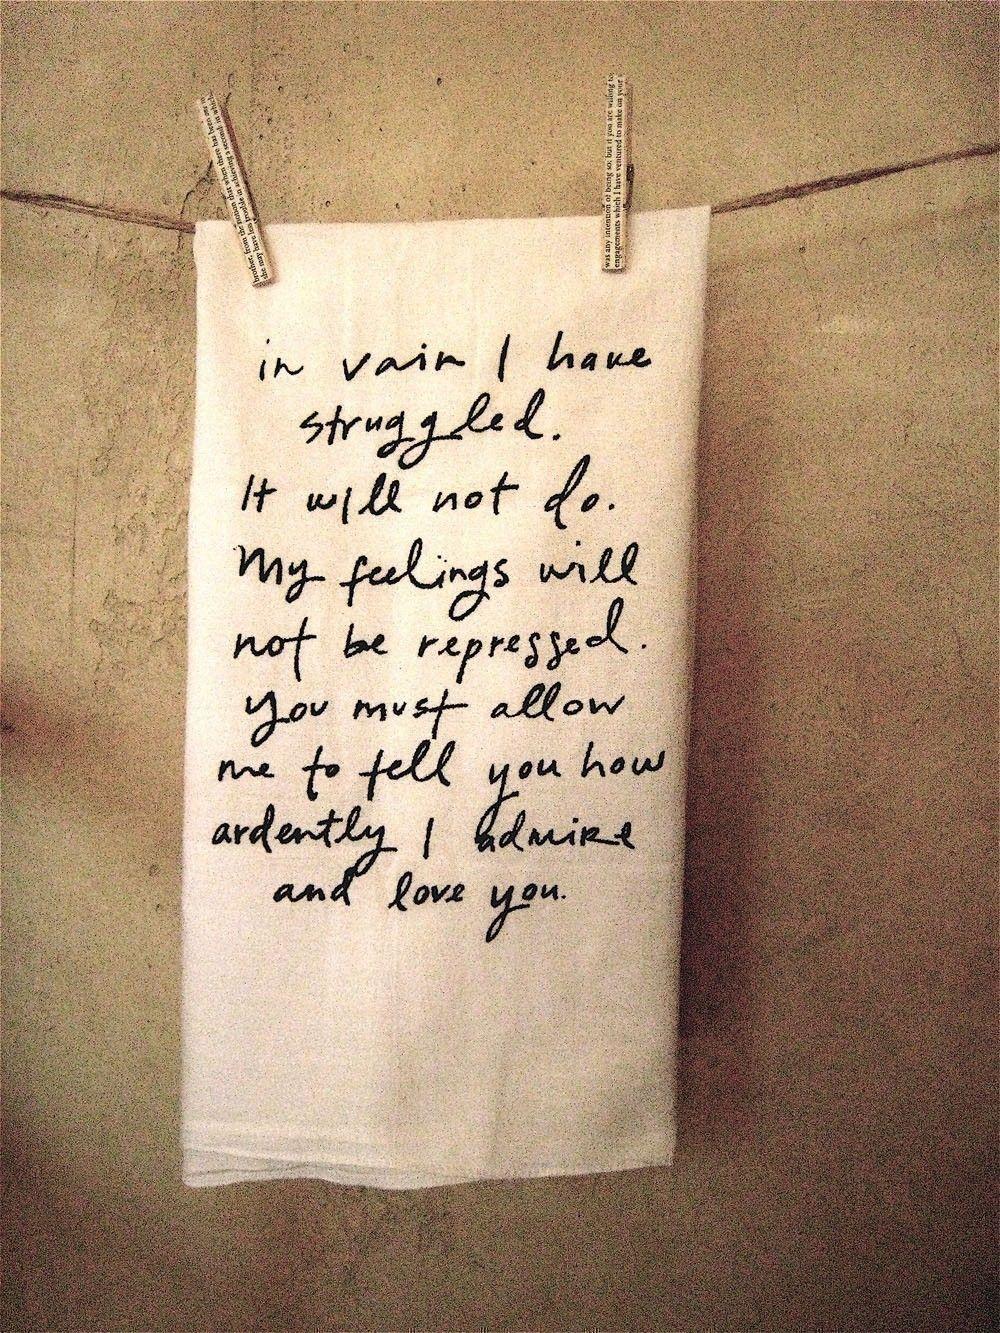 sigh....Mr. Darcy...